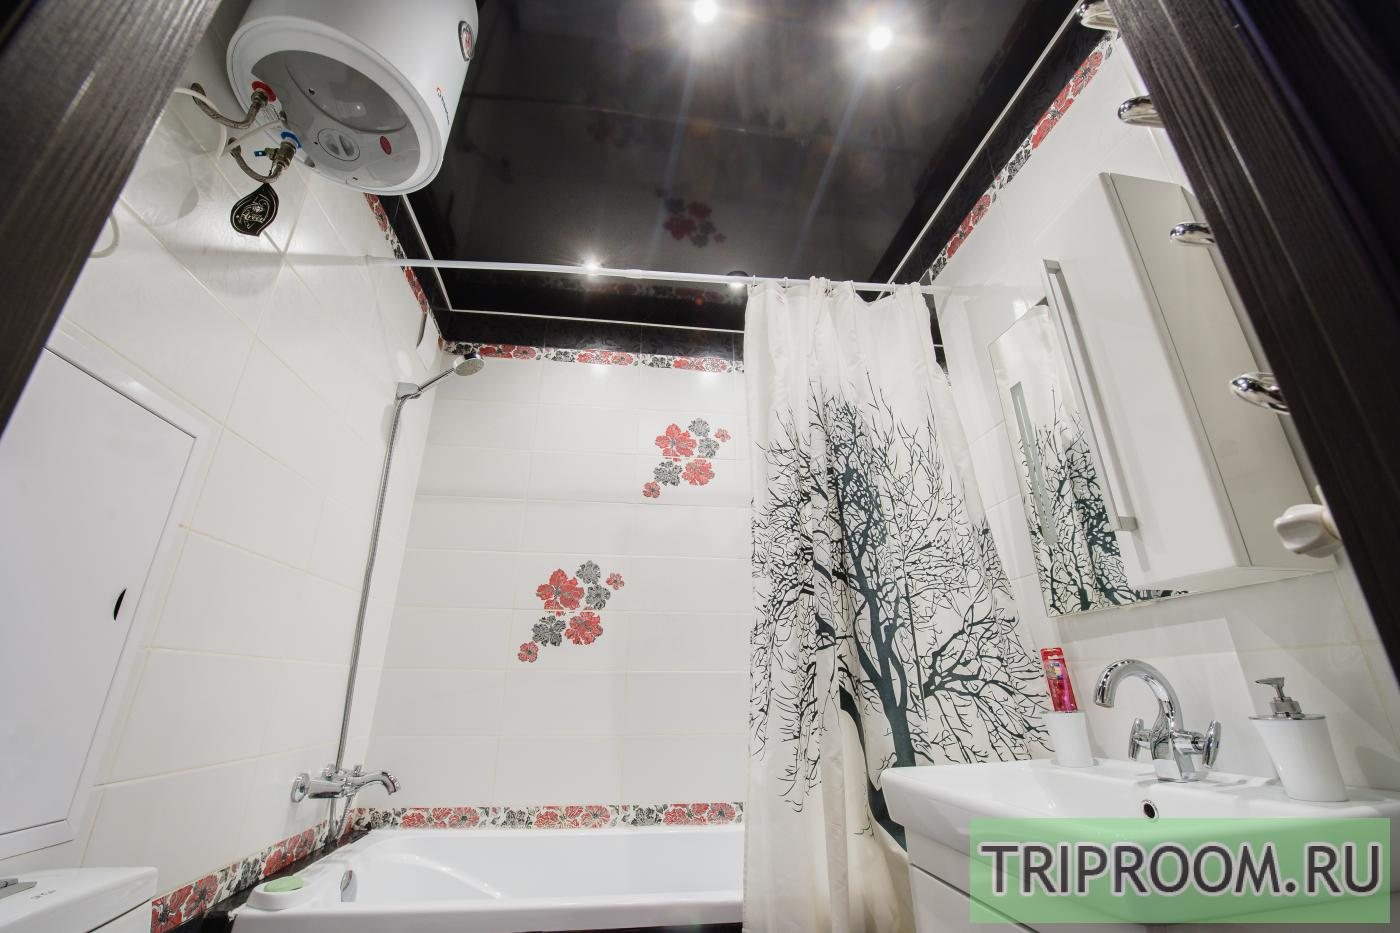 1-комнатная квартира посуточно (вариант № 14780), ул. Шевченко улица, фото № 9